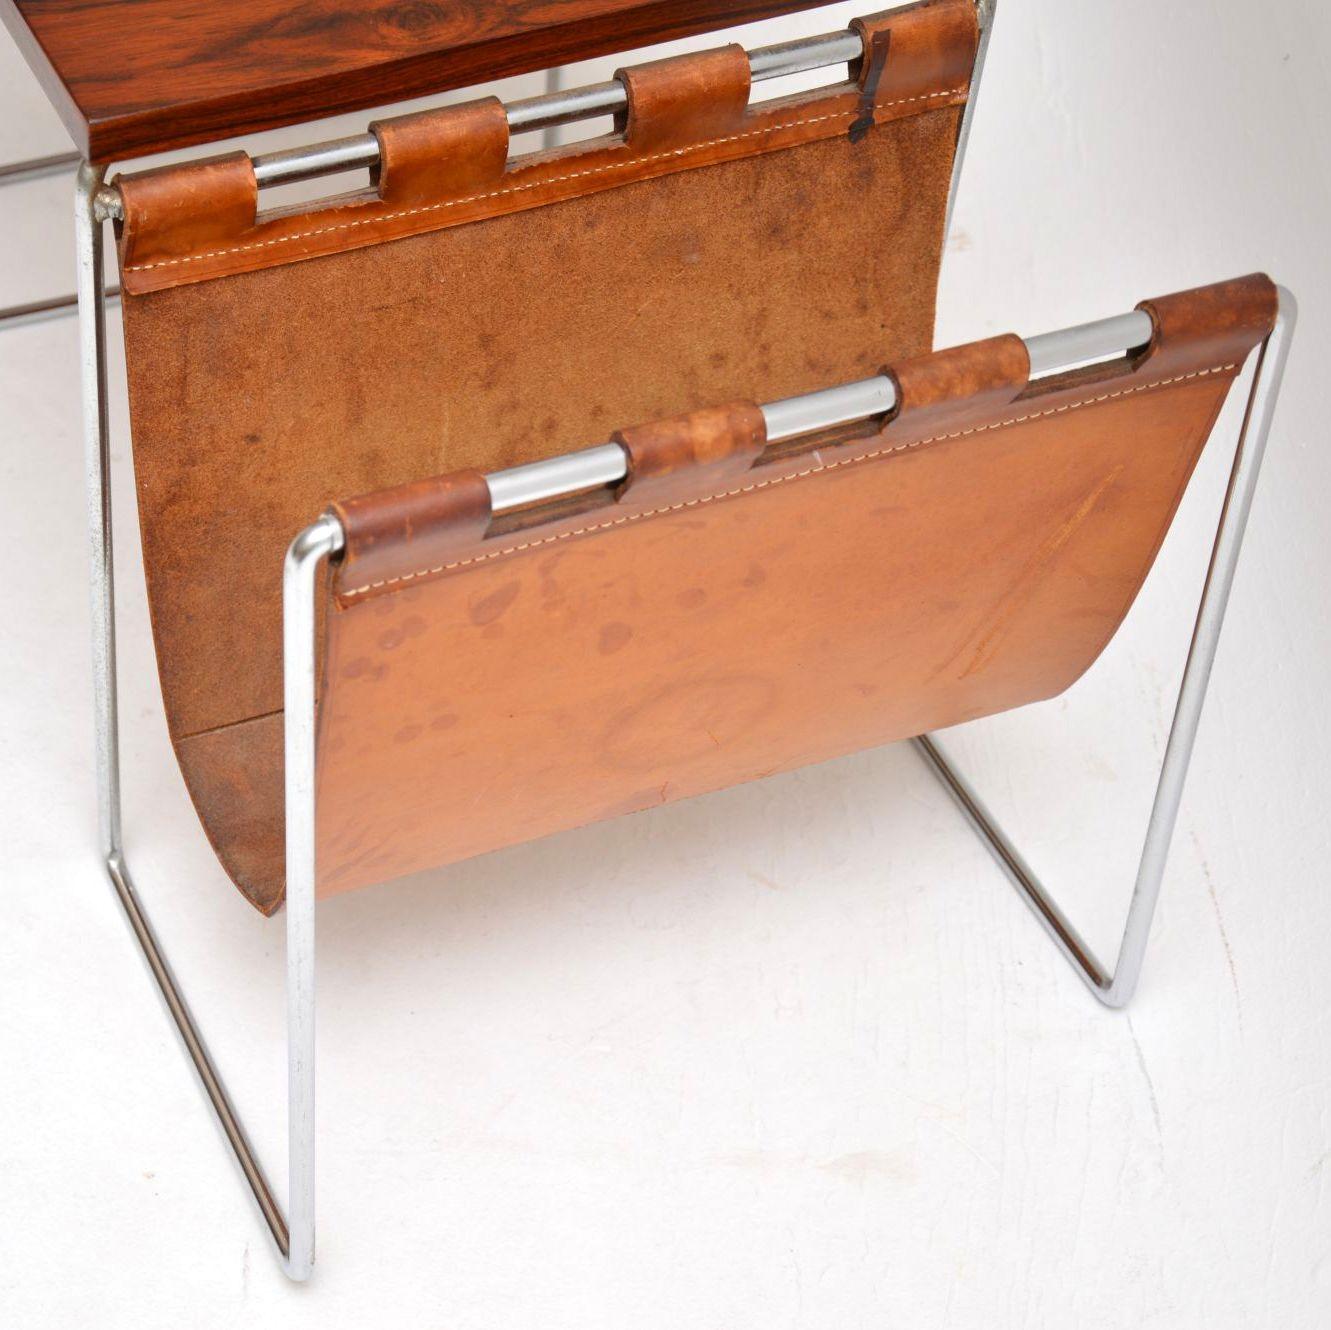 retro_vintage_rosewood_nest_of_tables_magazine_rack_brabantus_9